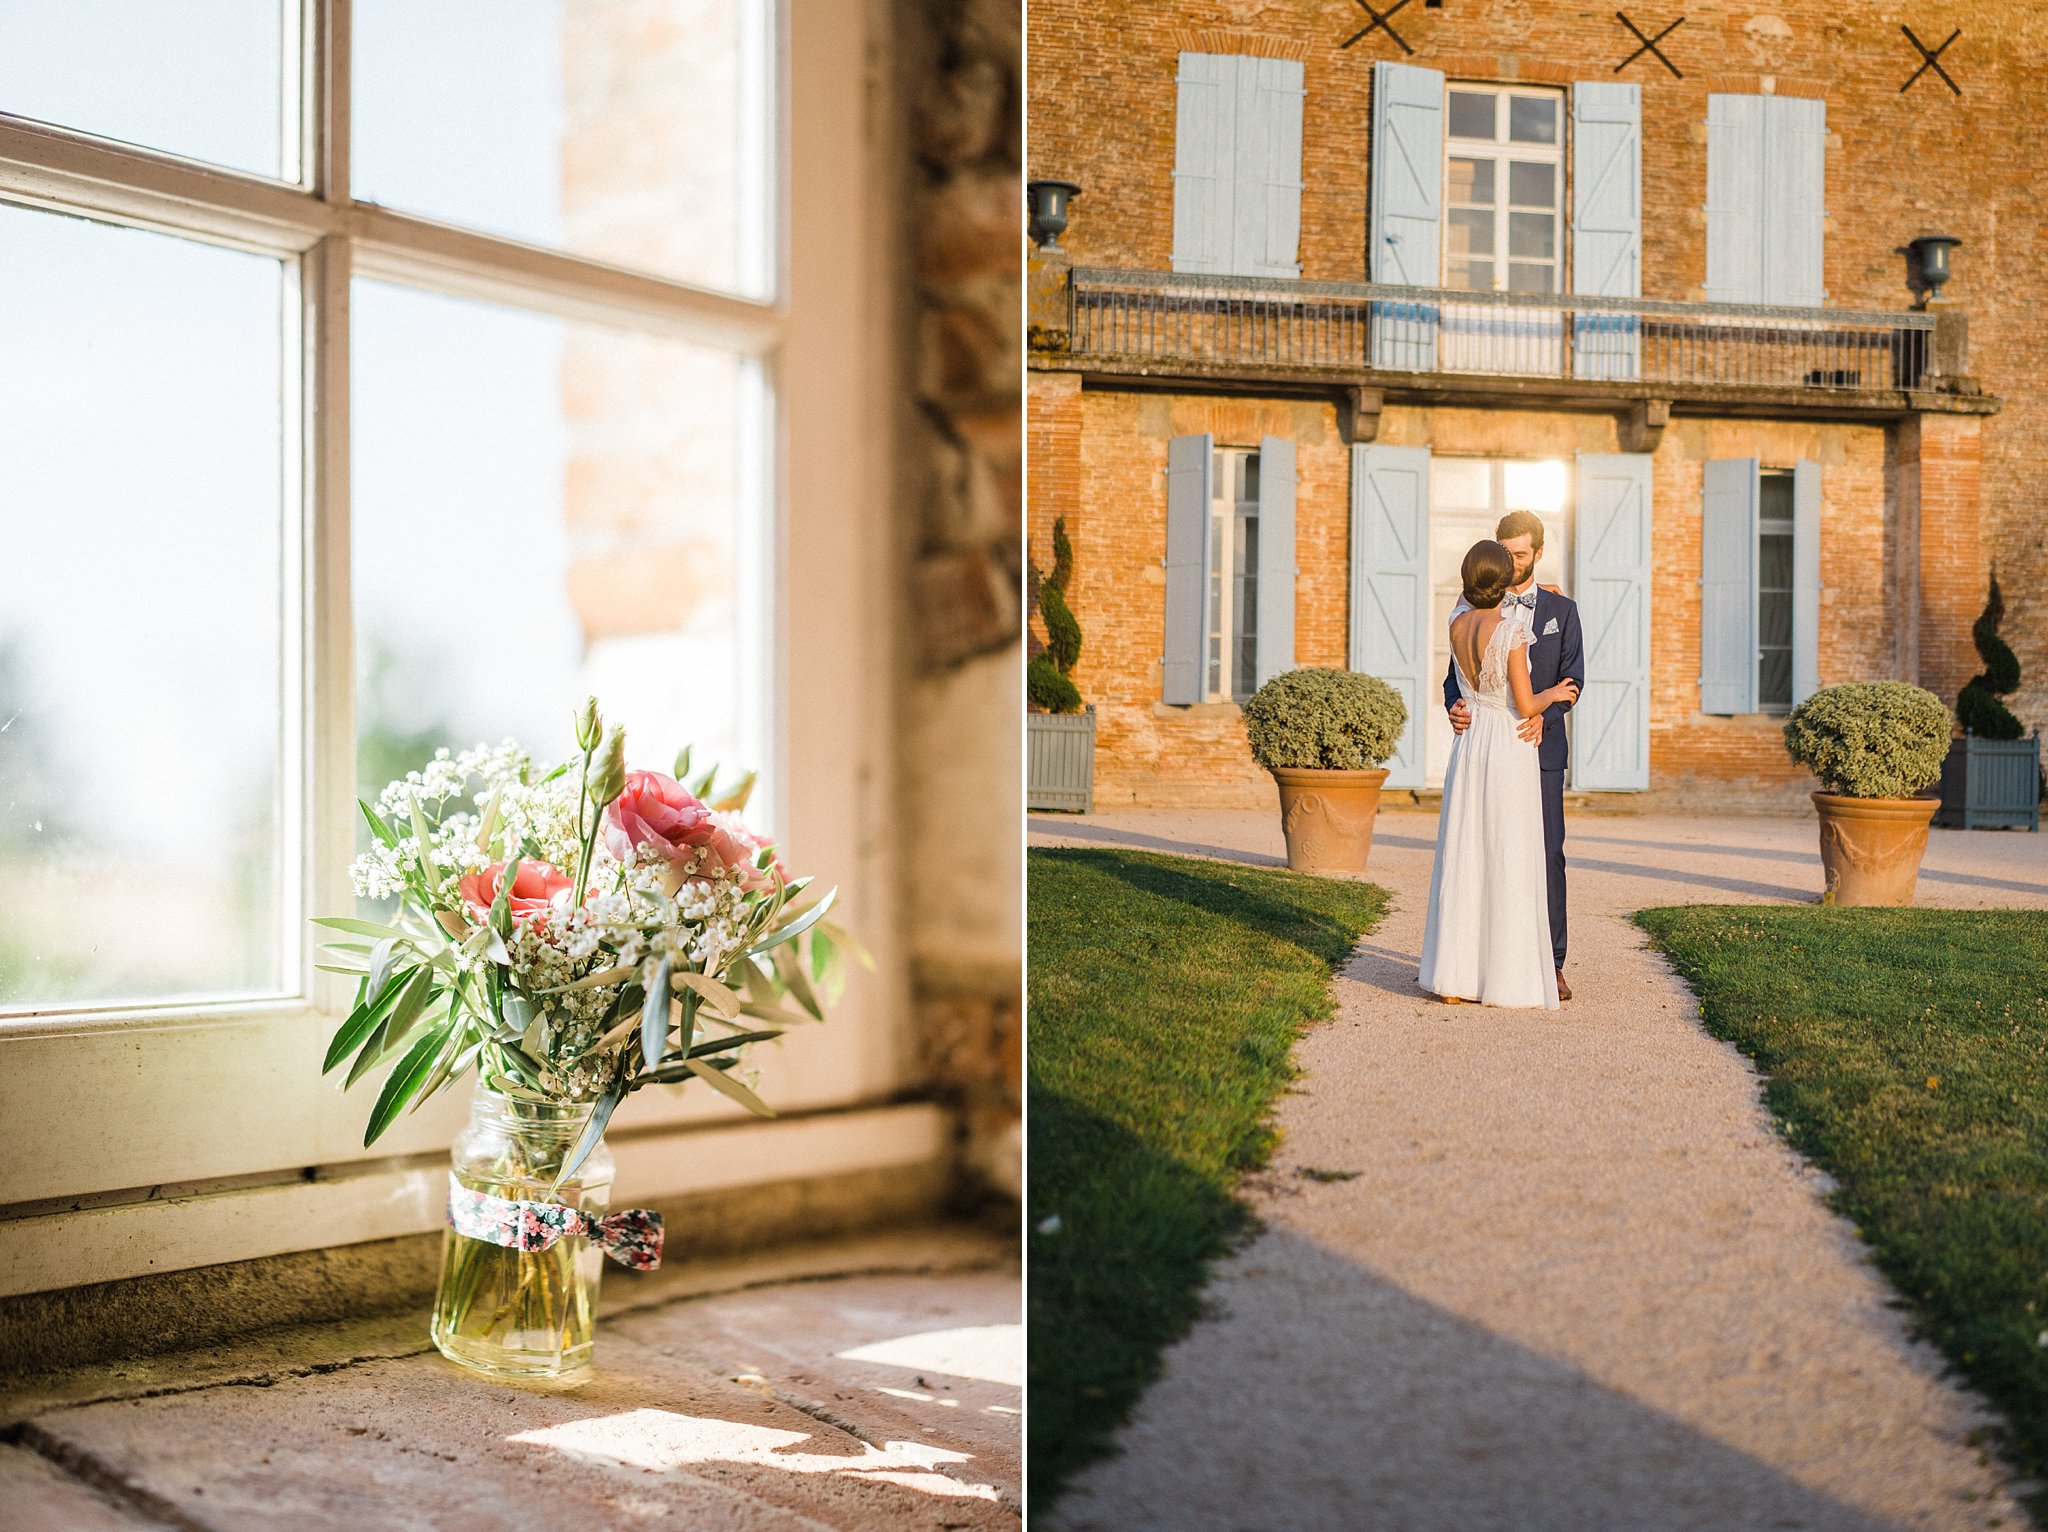 Mariage-a-la-maison-secall-hugo-hennequin-photographe-mariage-perpignan_0093.jpg